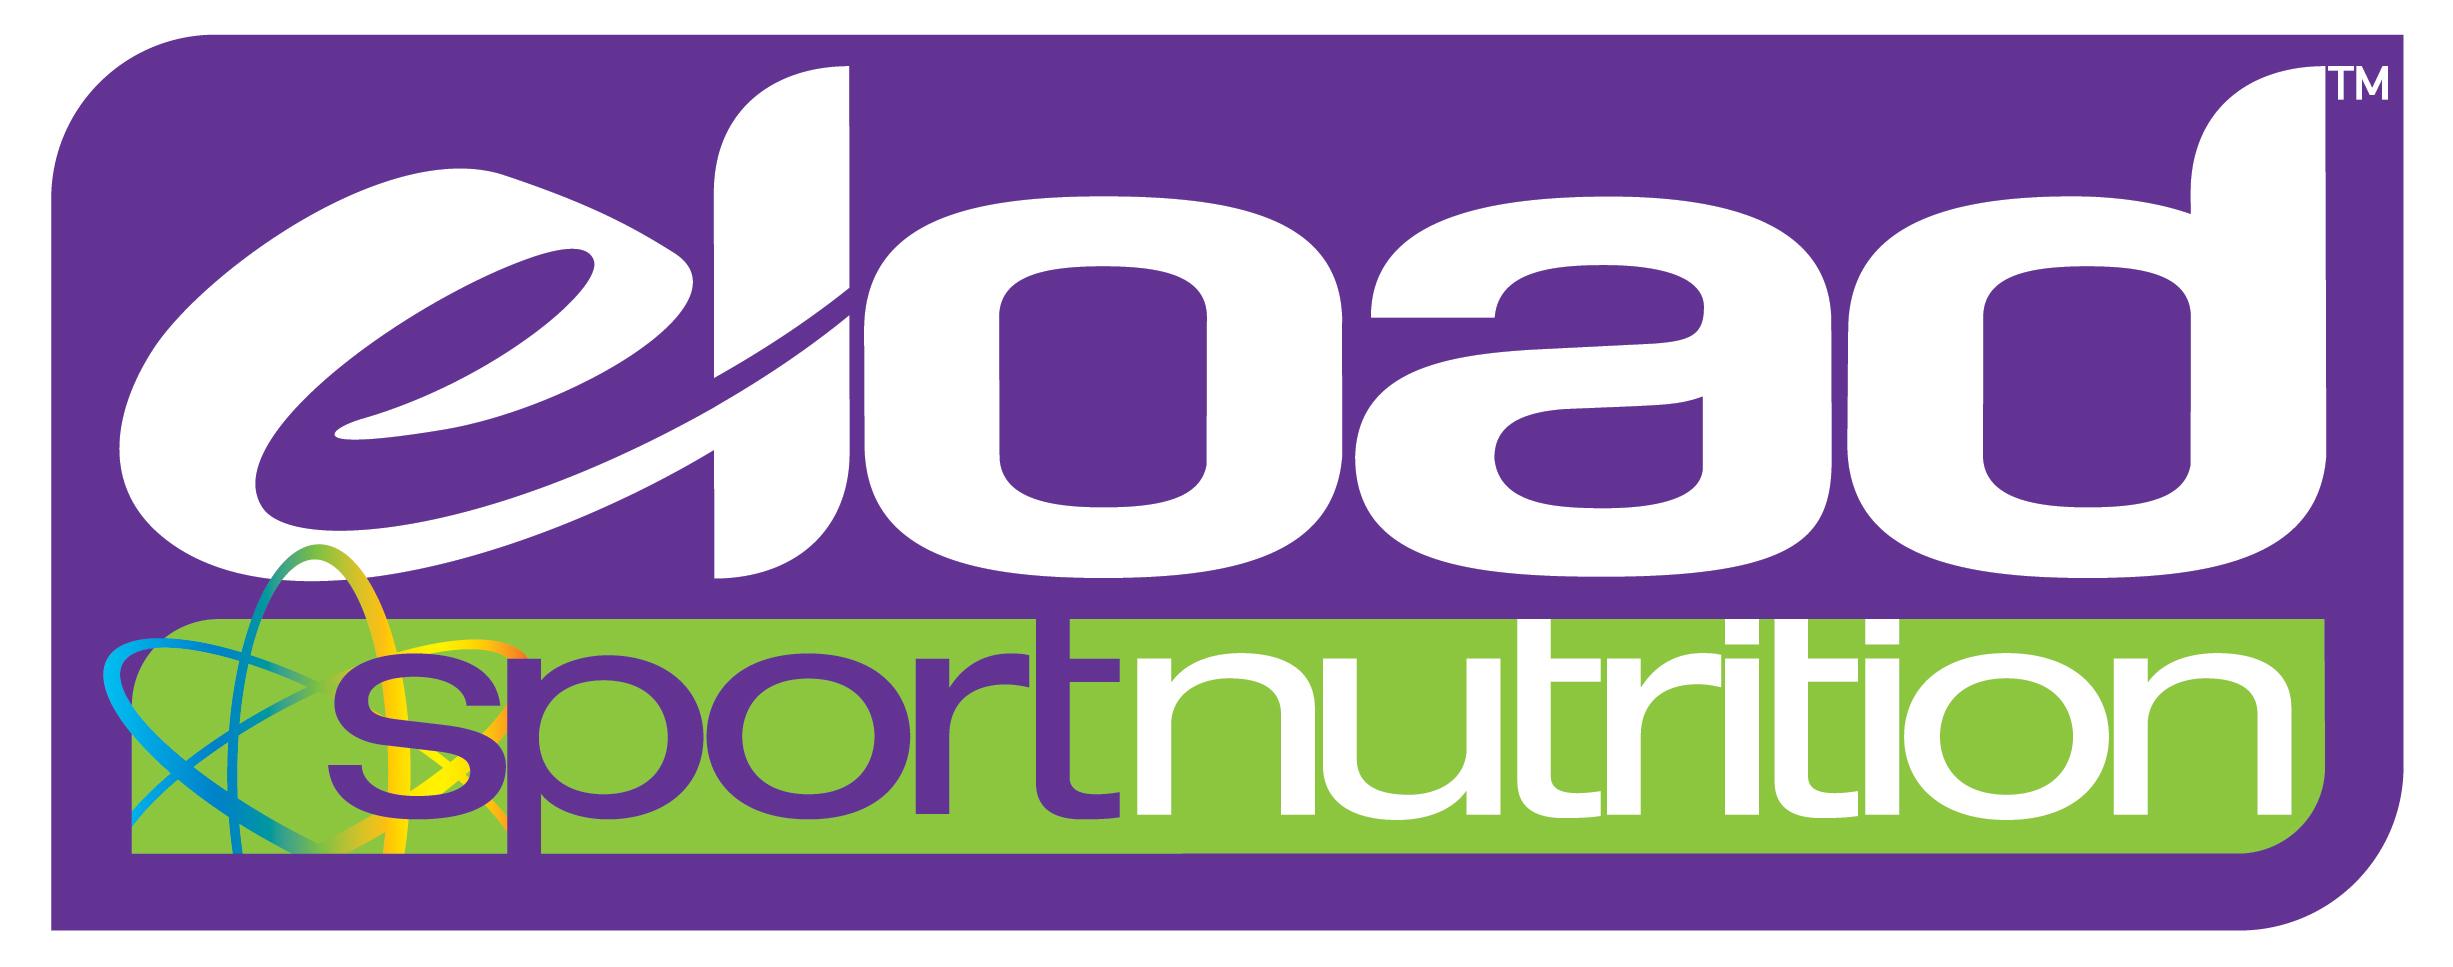 eload_sportnutrition_OnDark.jpg